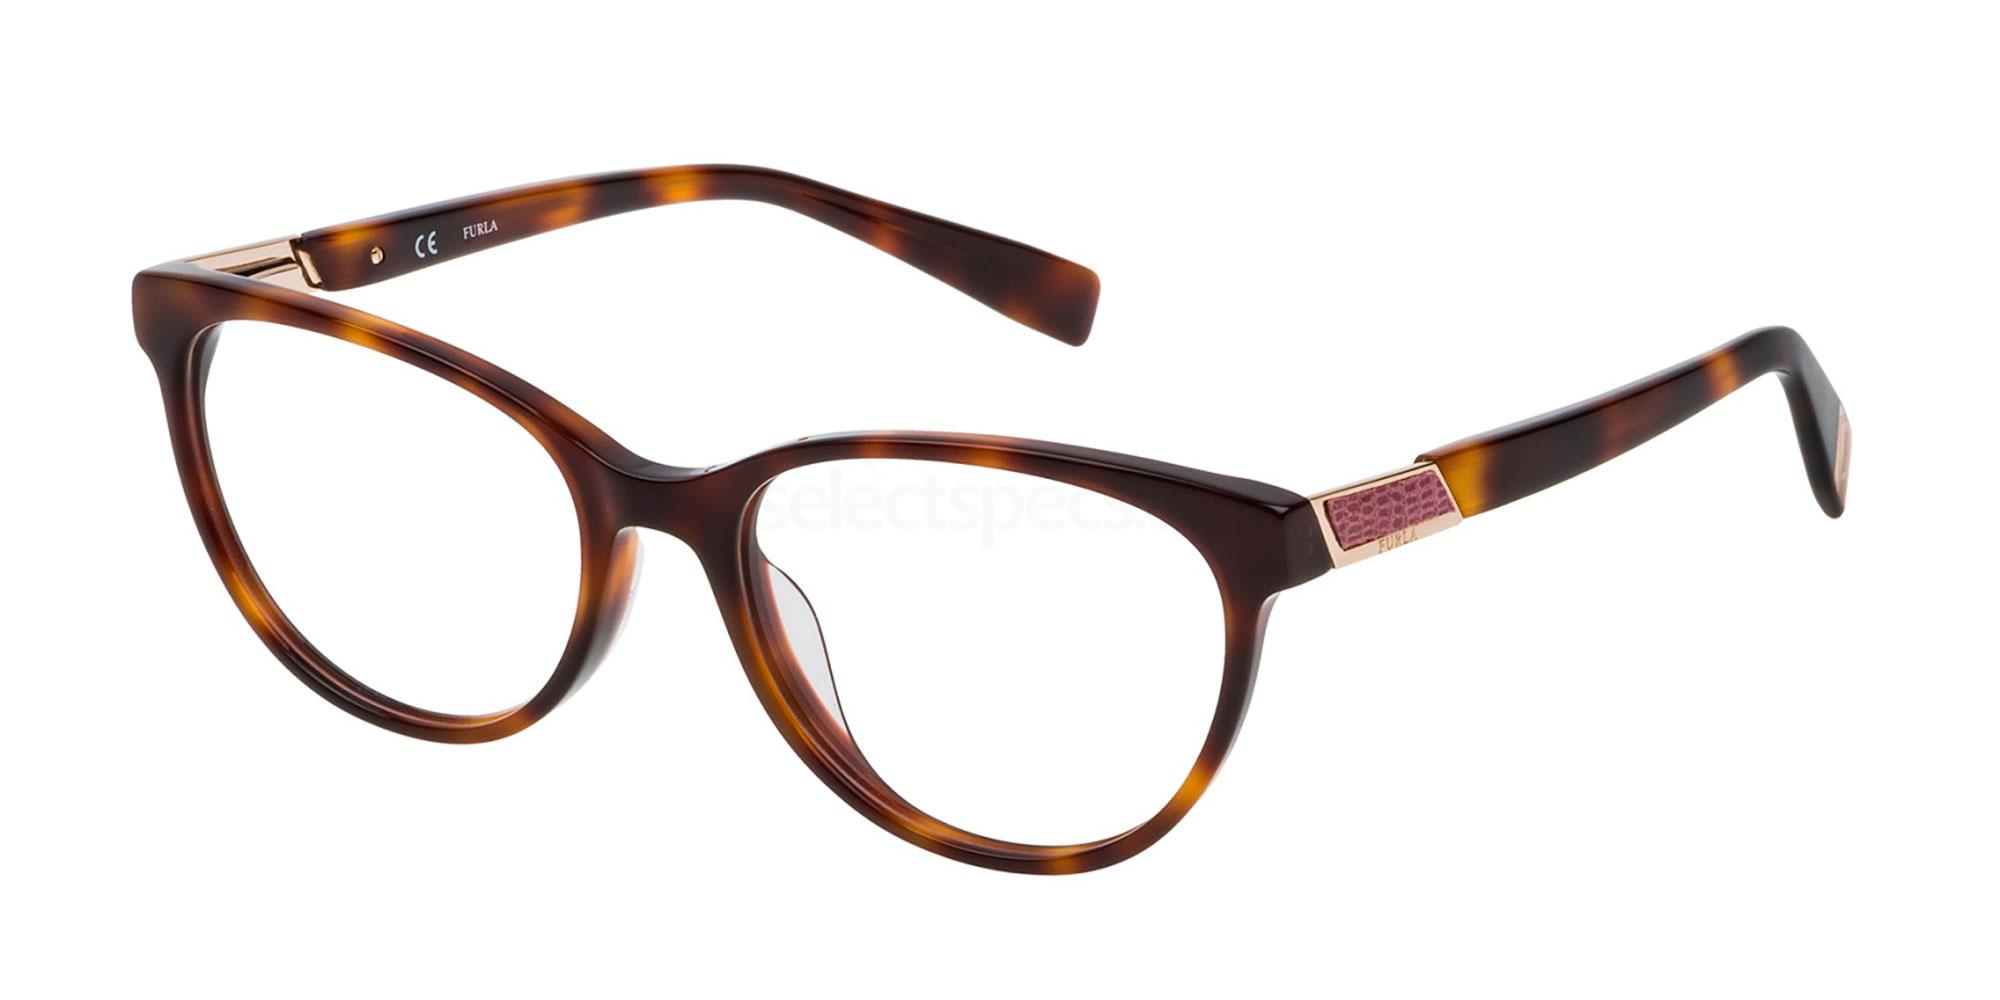 0752 VFU086 Glasses, Furla